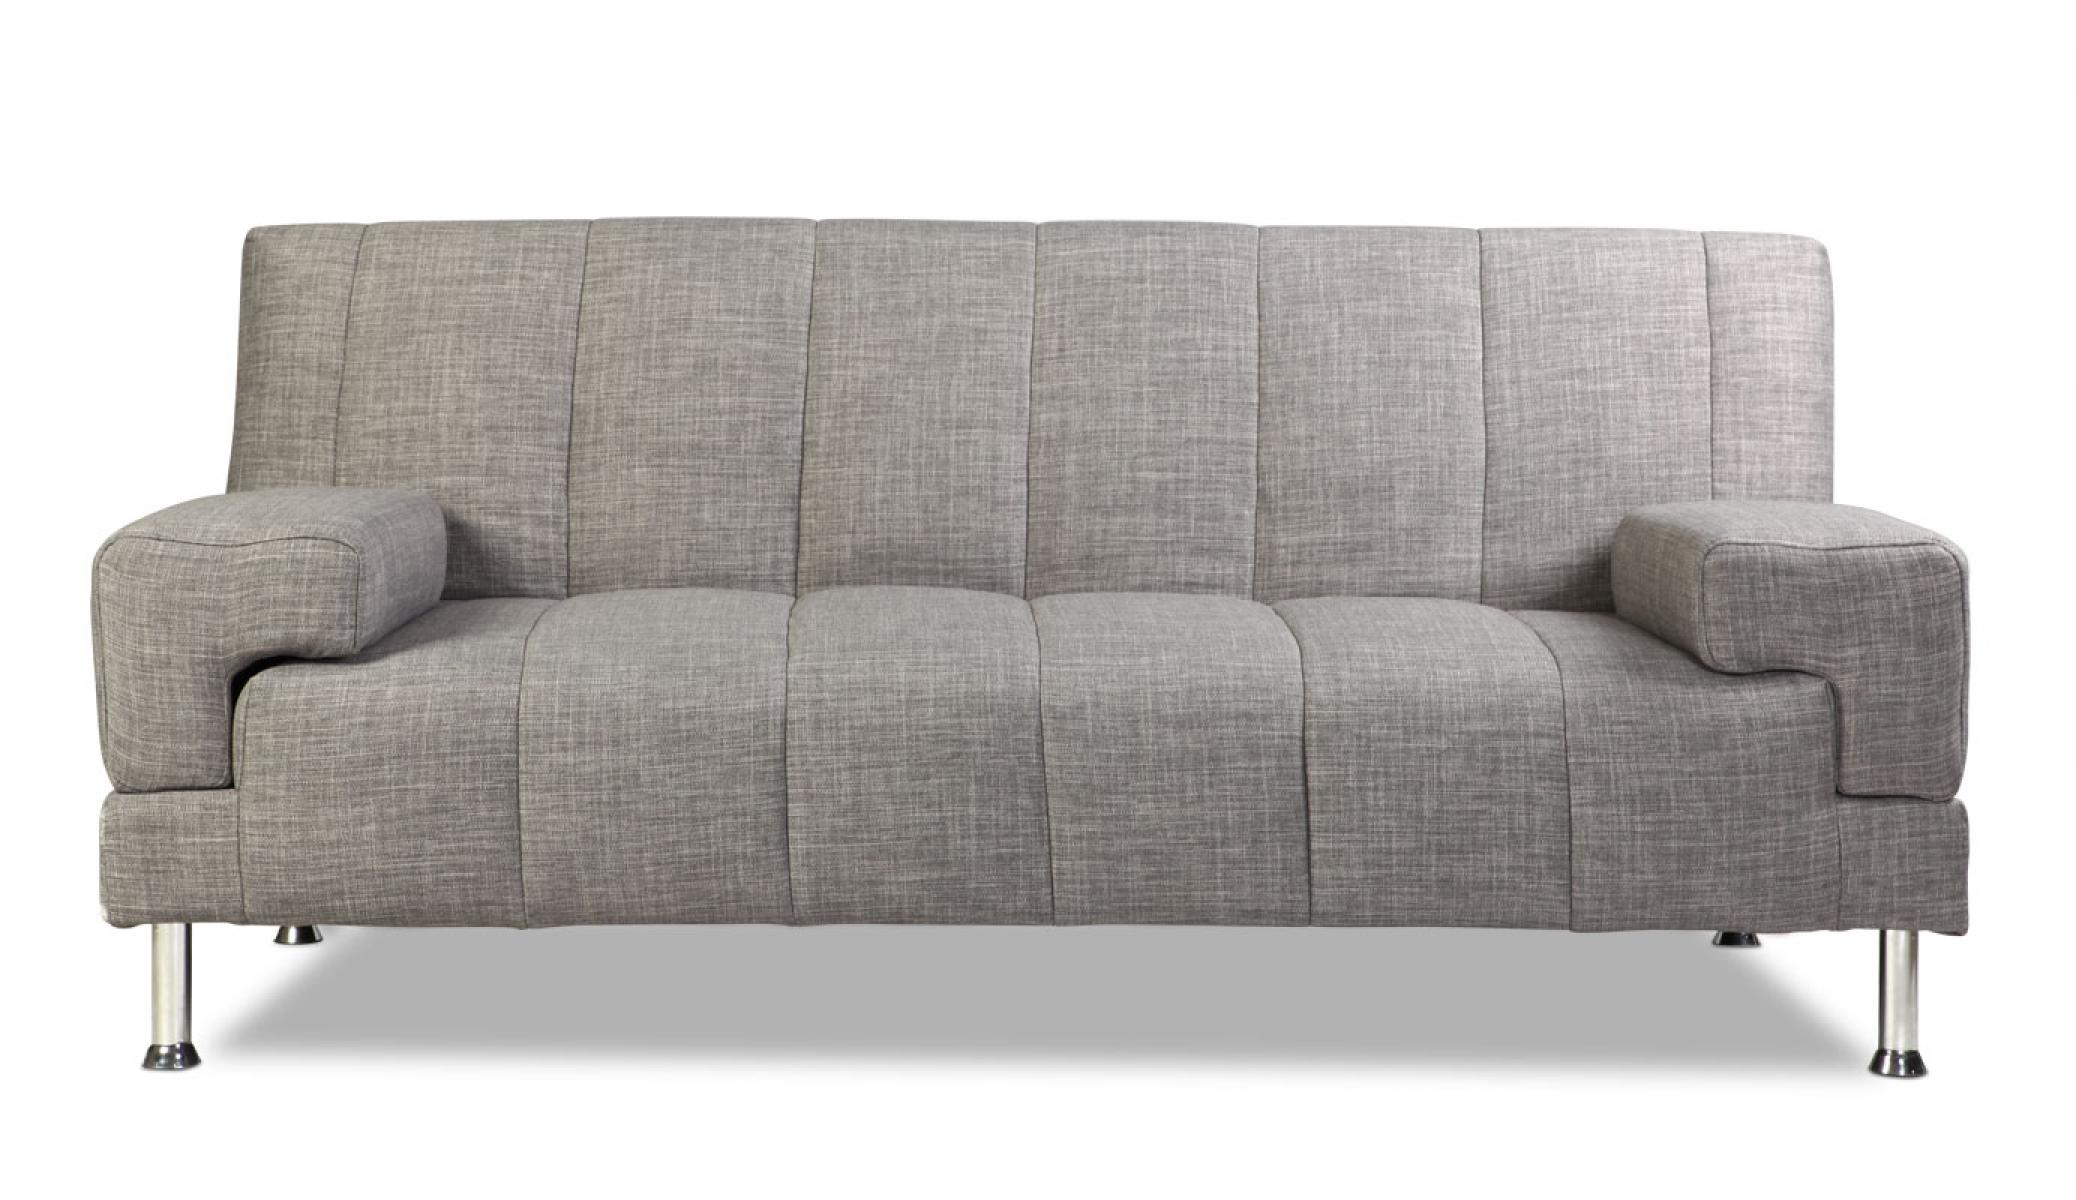 photos canap lit convertible pas cher. Black Bedroom Furniture Sets. Home Design Ideas